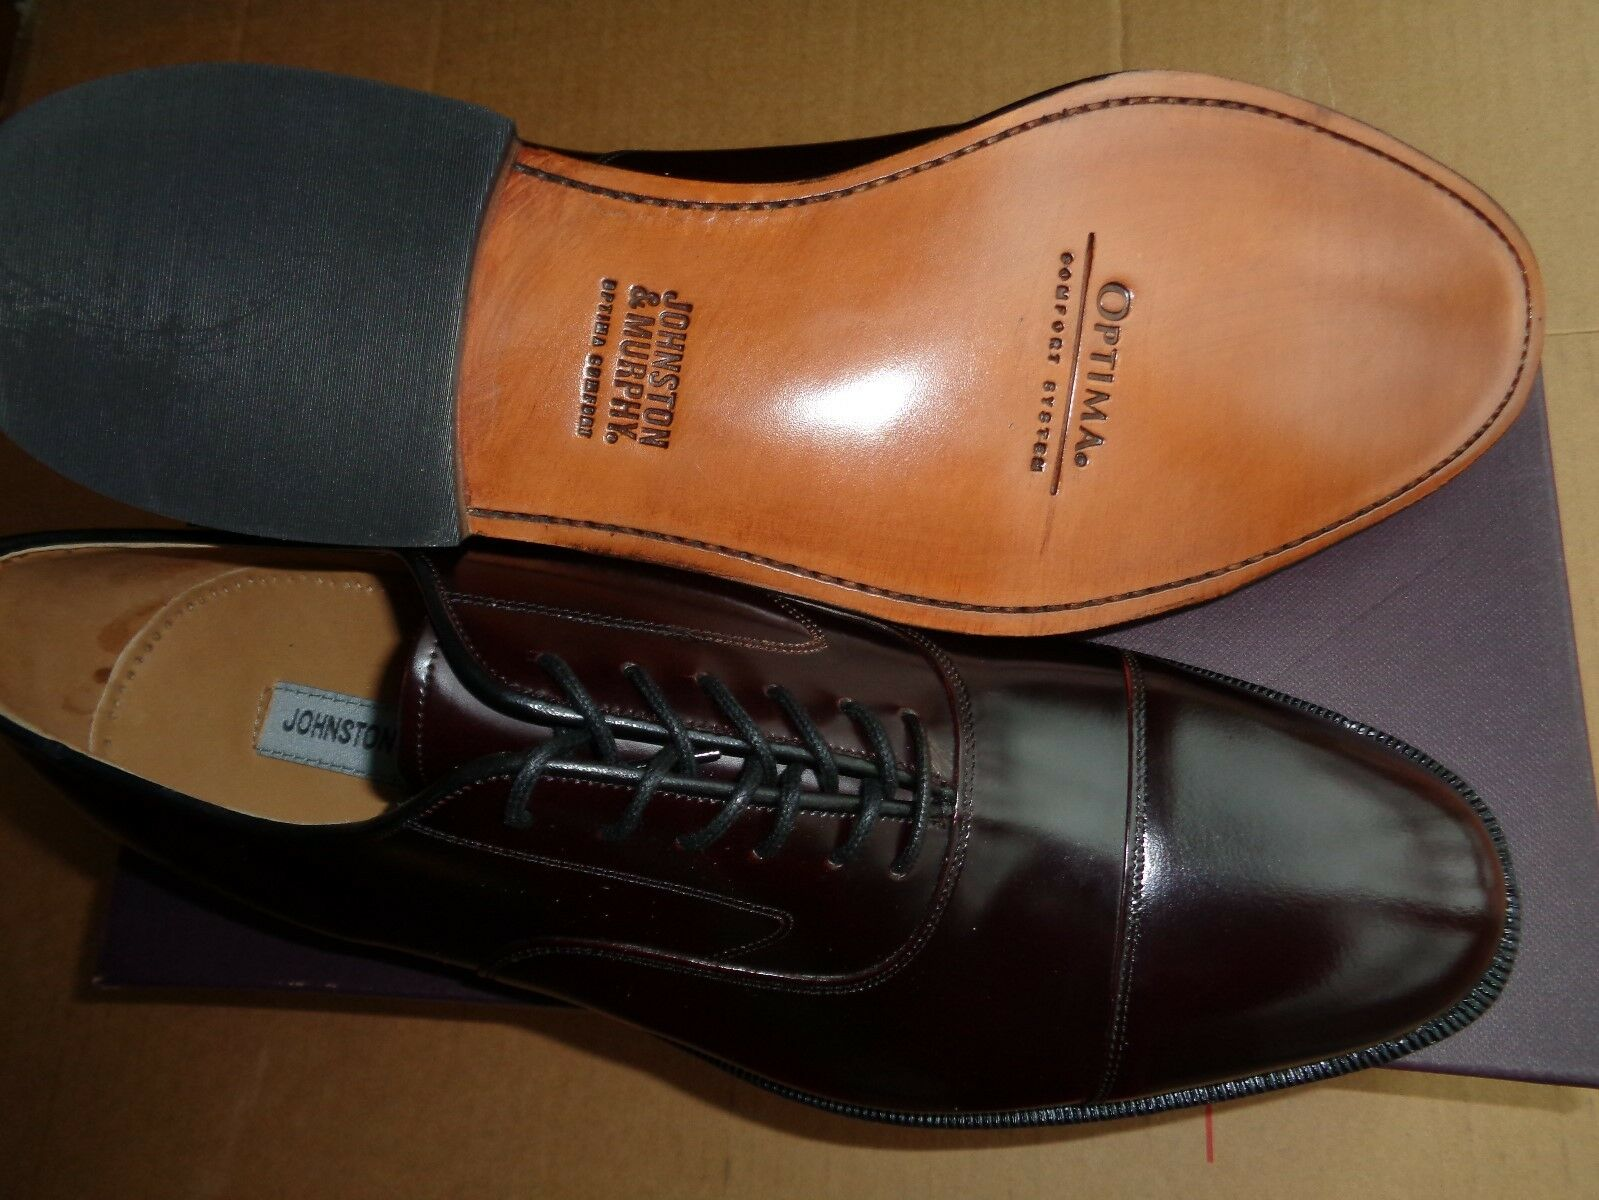 JohnstonΜrphy, Melton, burgandy, size 11.5D, genuine leather, new in box